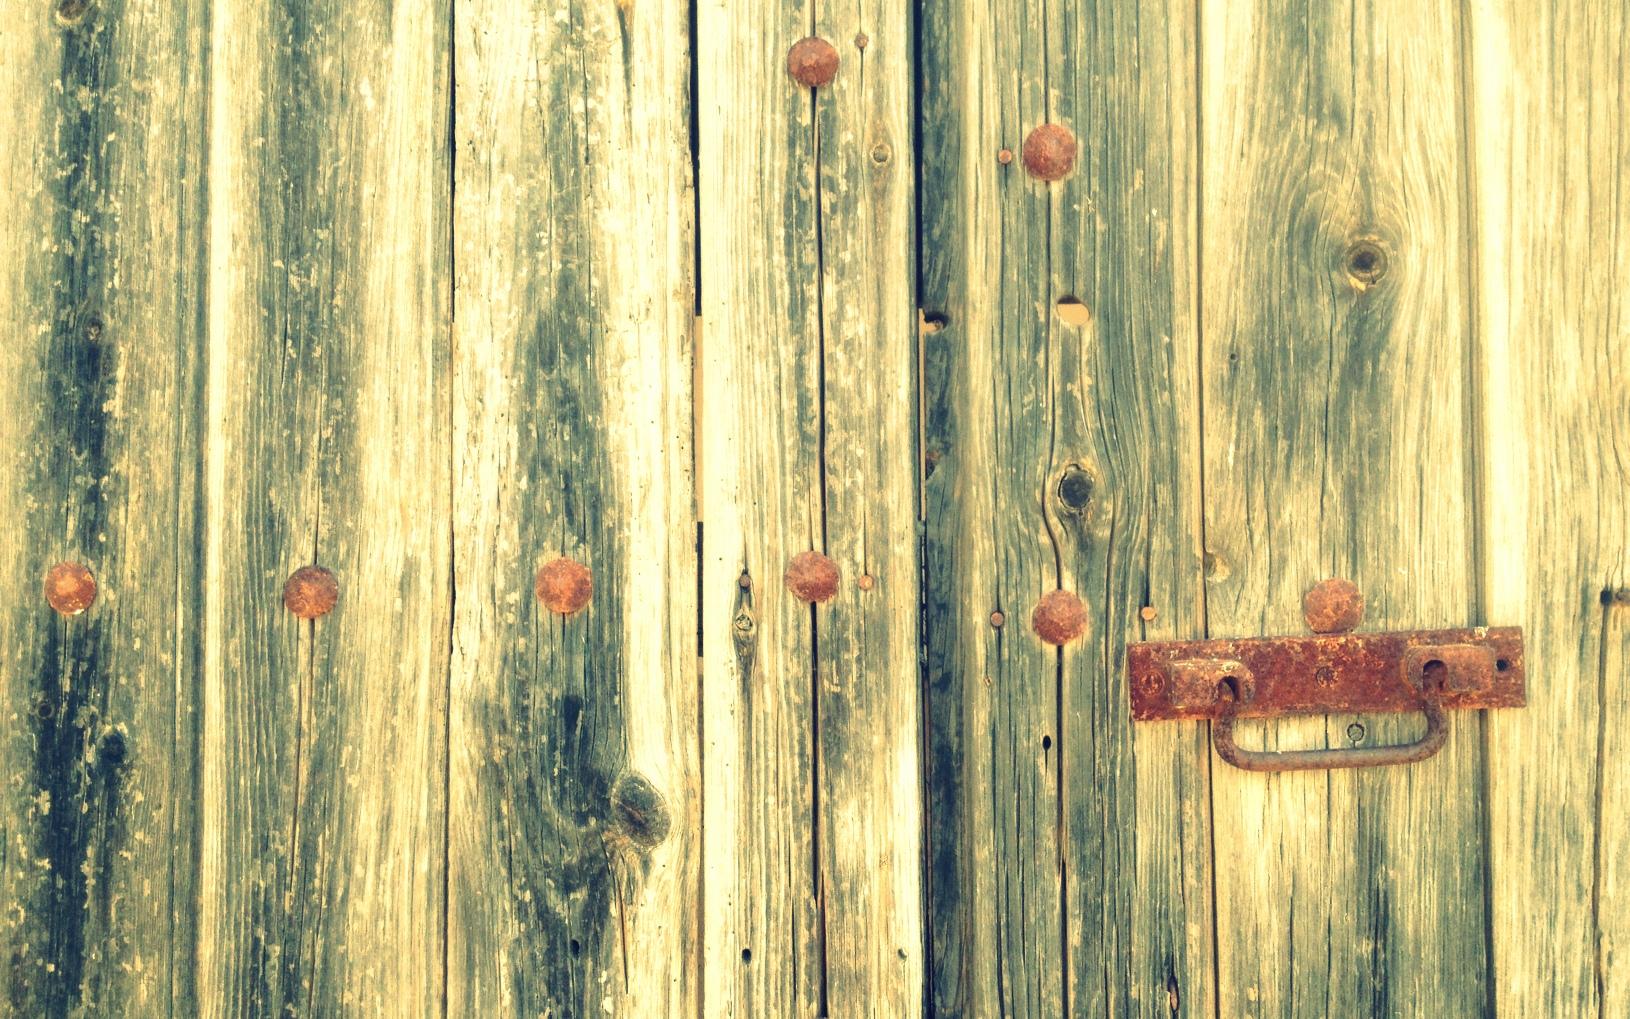 custodia llave emporda costa brava